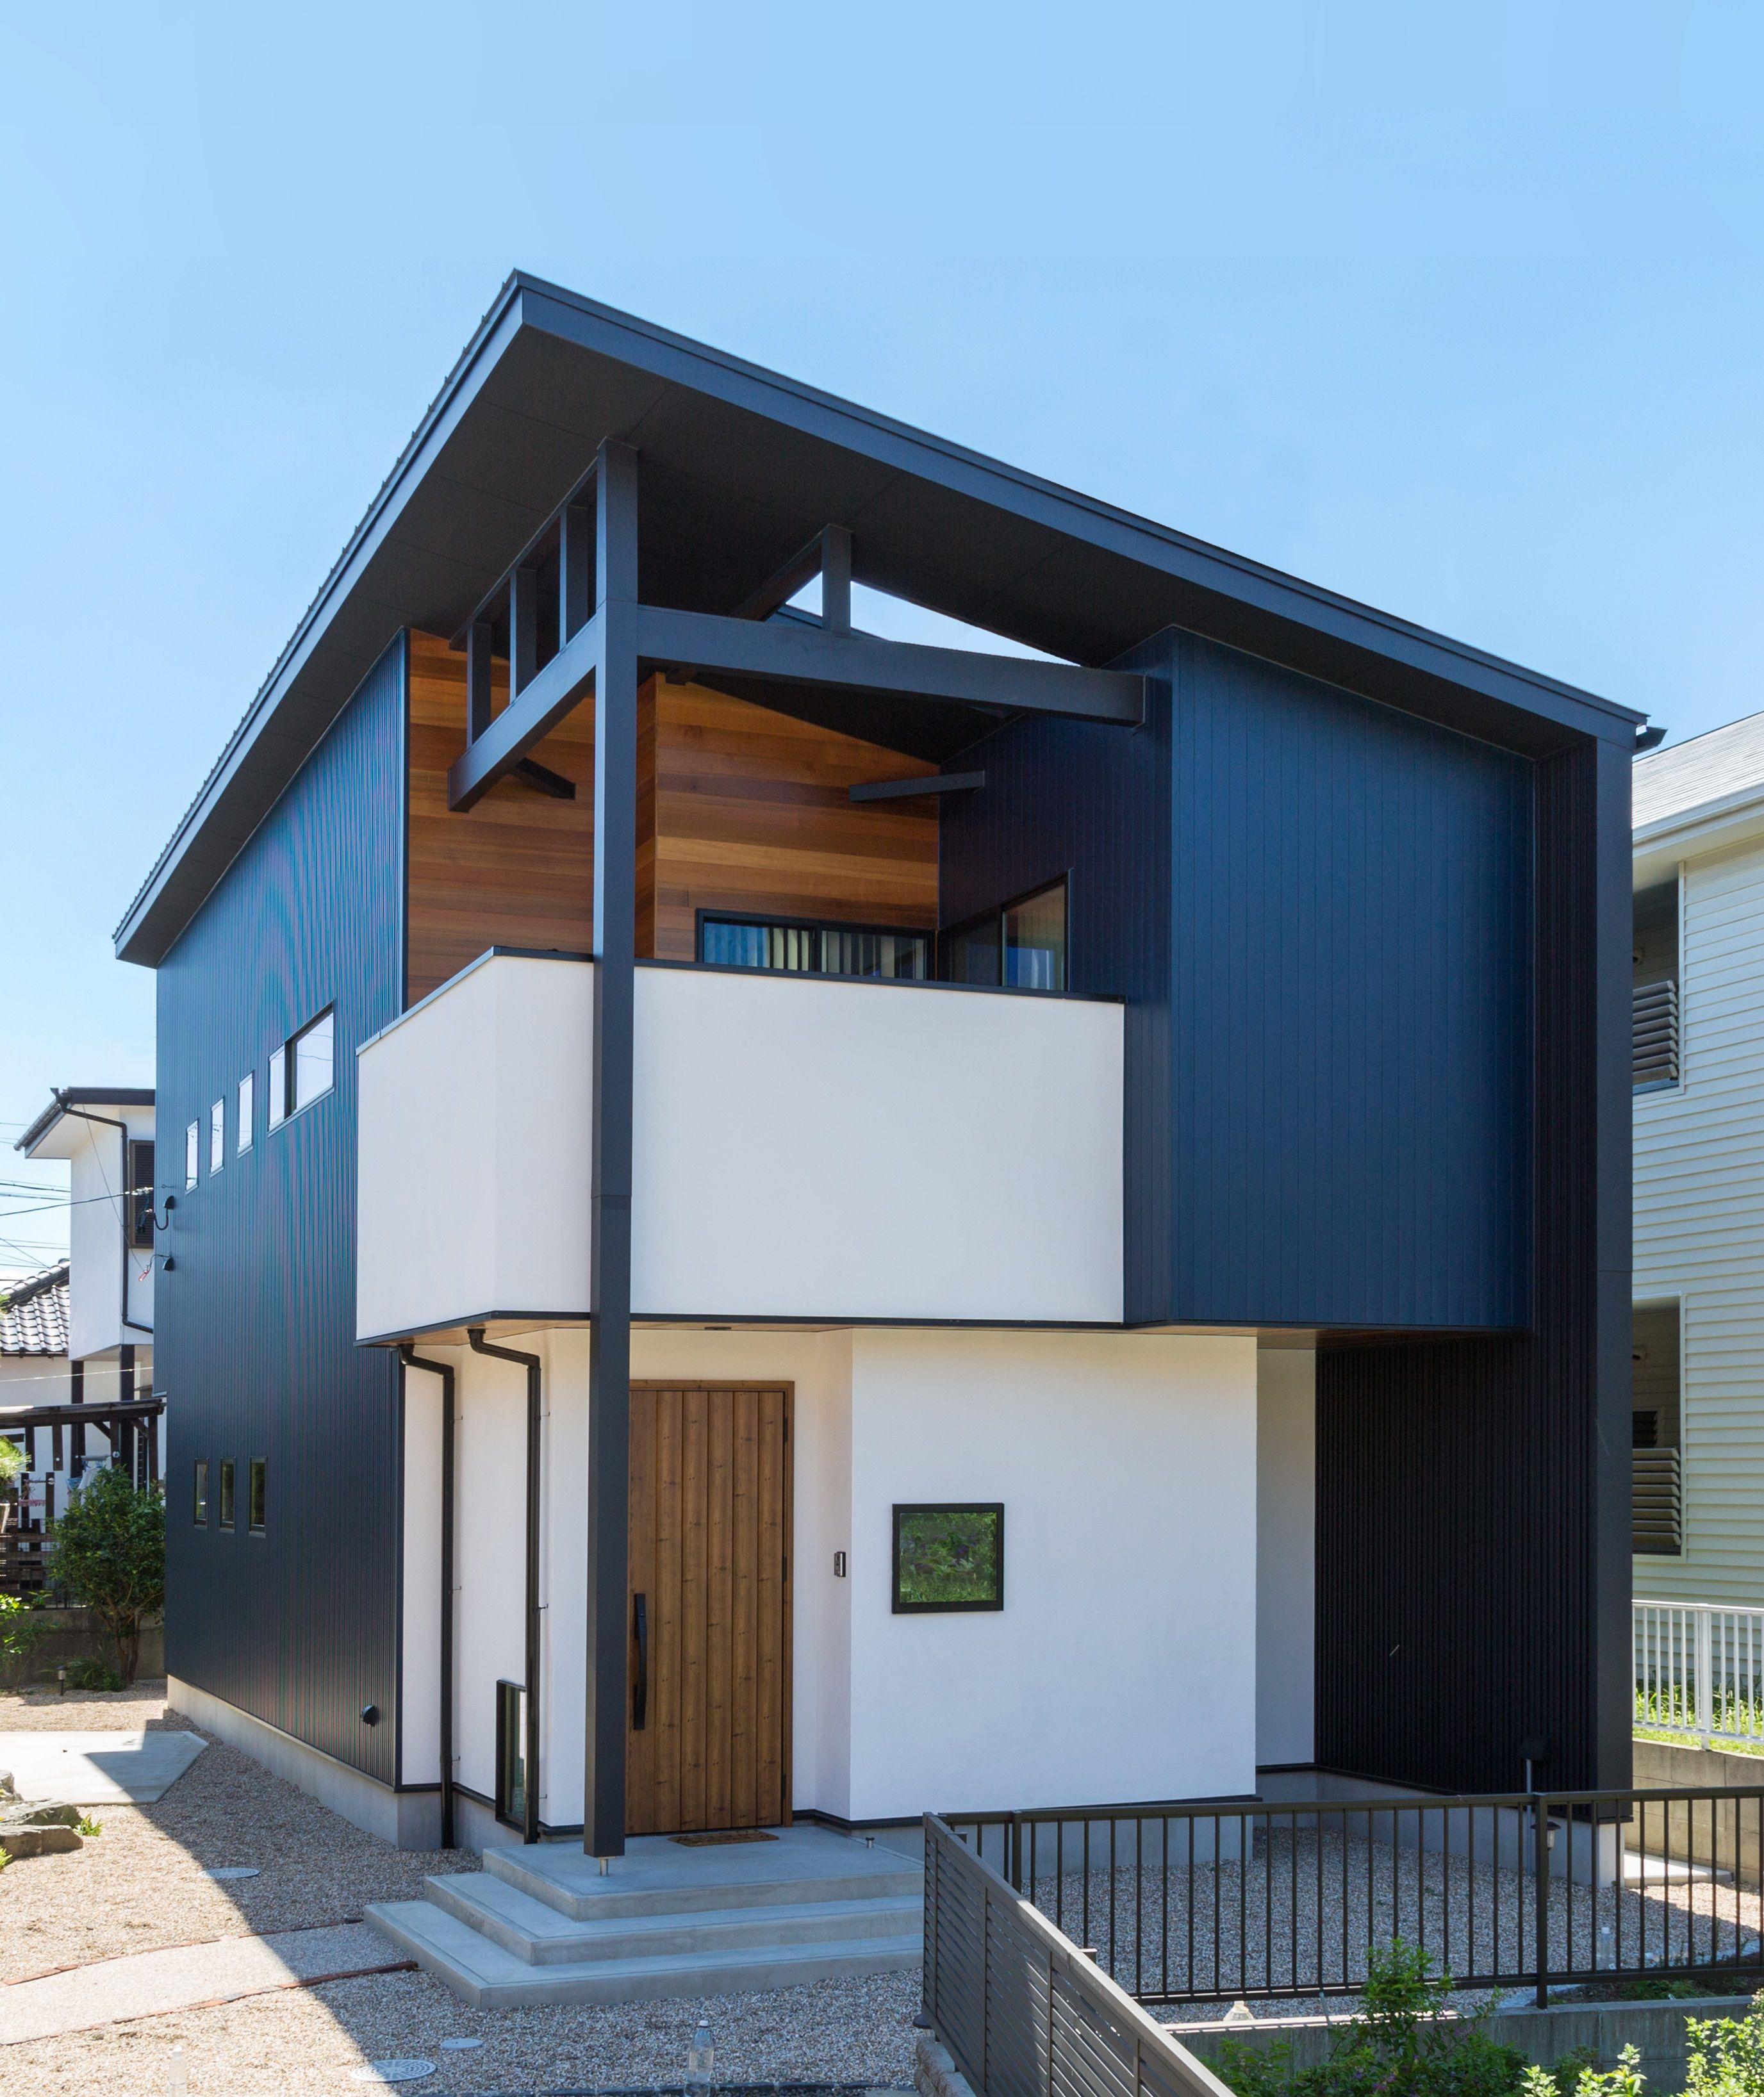 Ue Bo Design ウエボデザイン 愛知県 安城市 注文住宅 施工